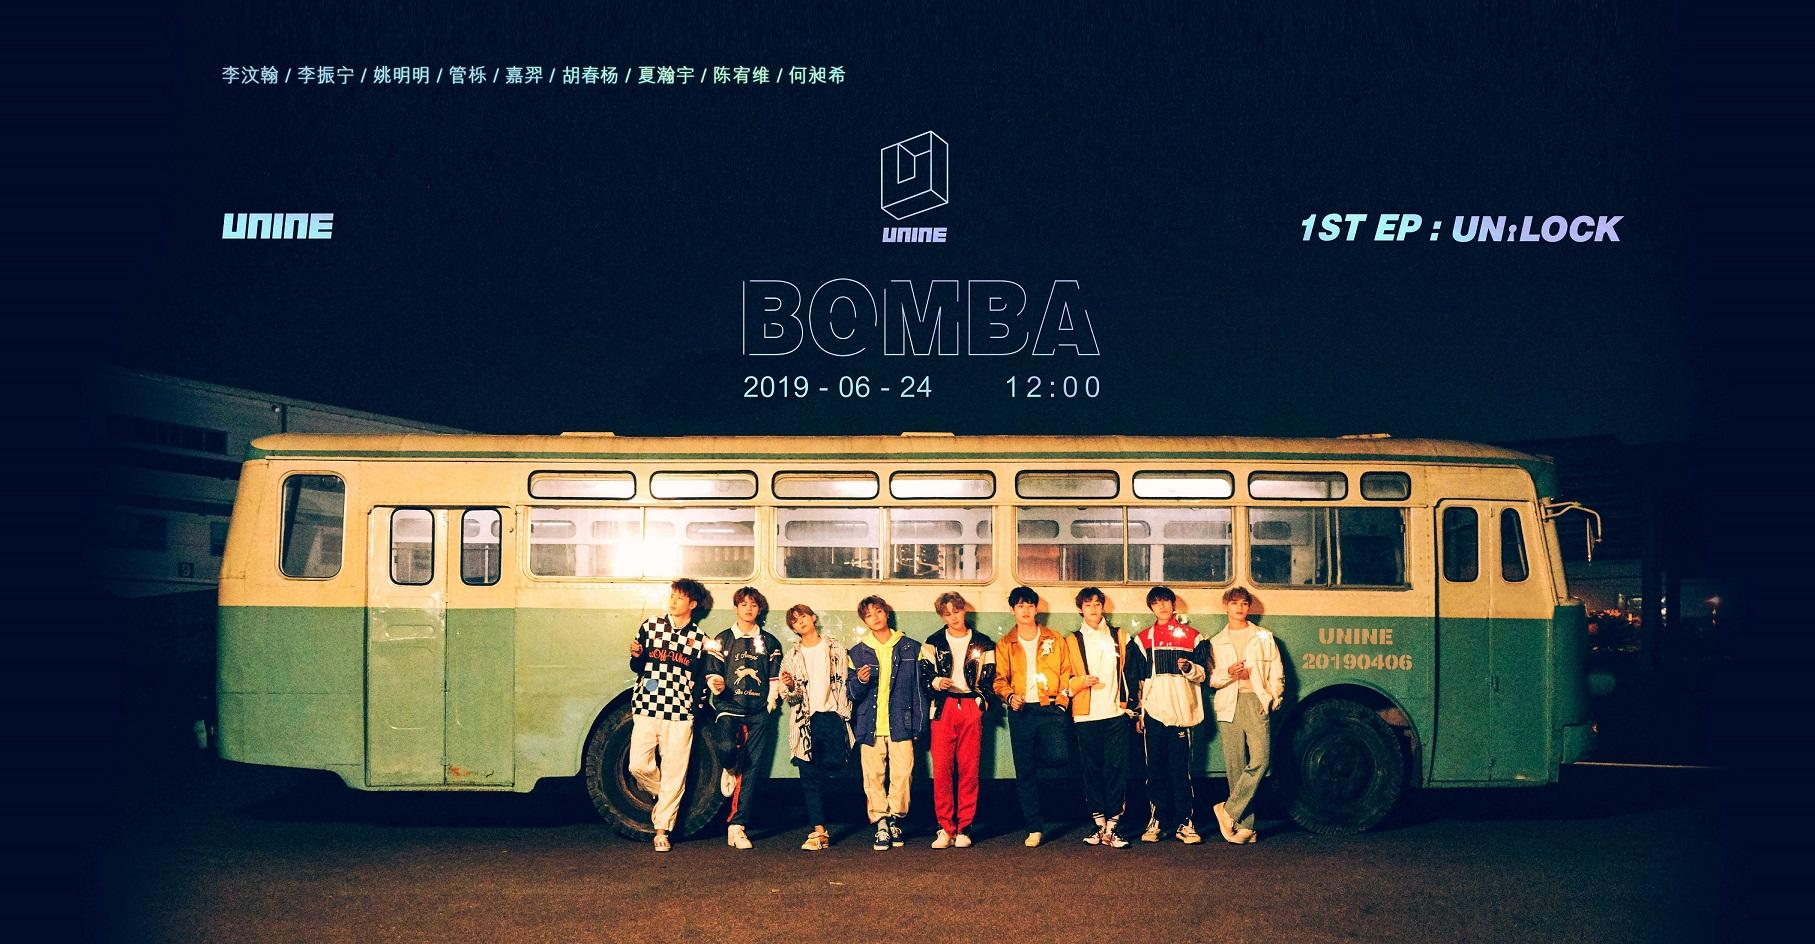 UNINE《Bomba》MV正式上线 解锁青春热力一触即发